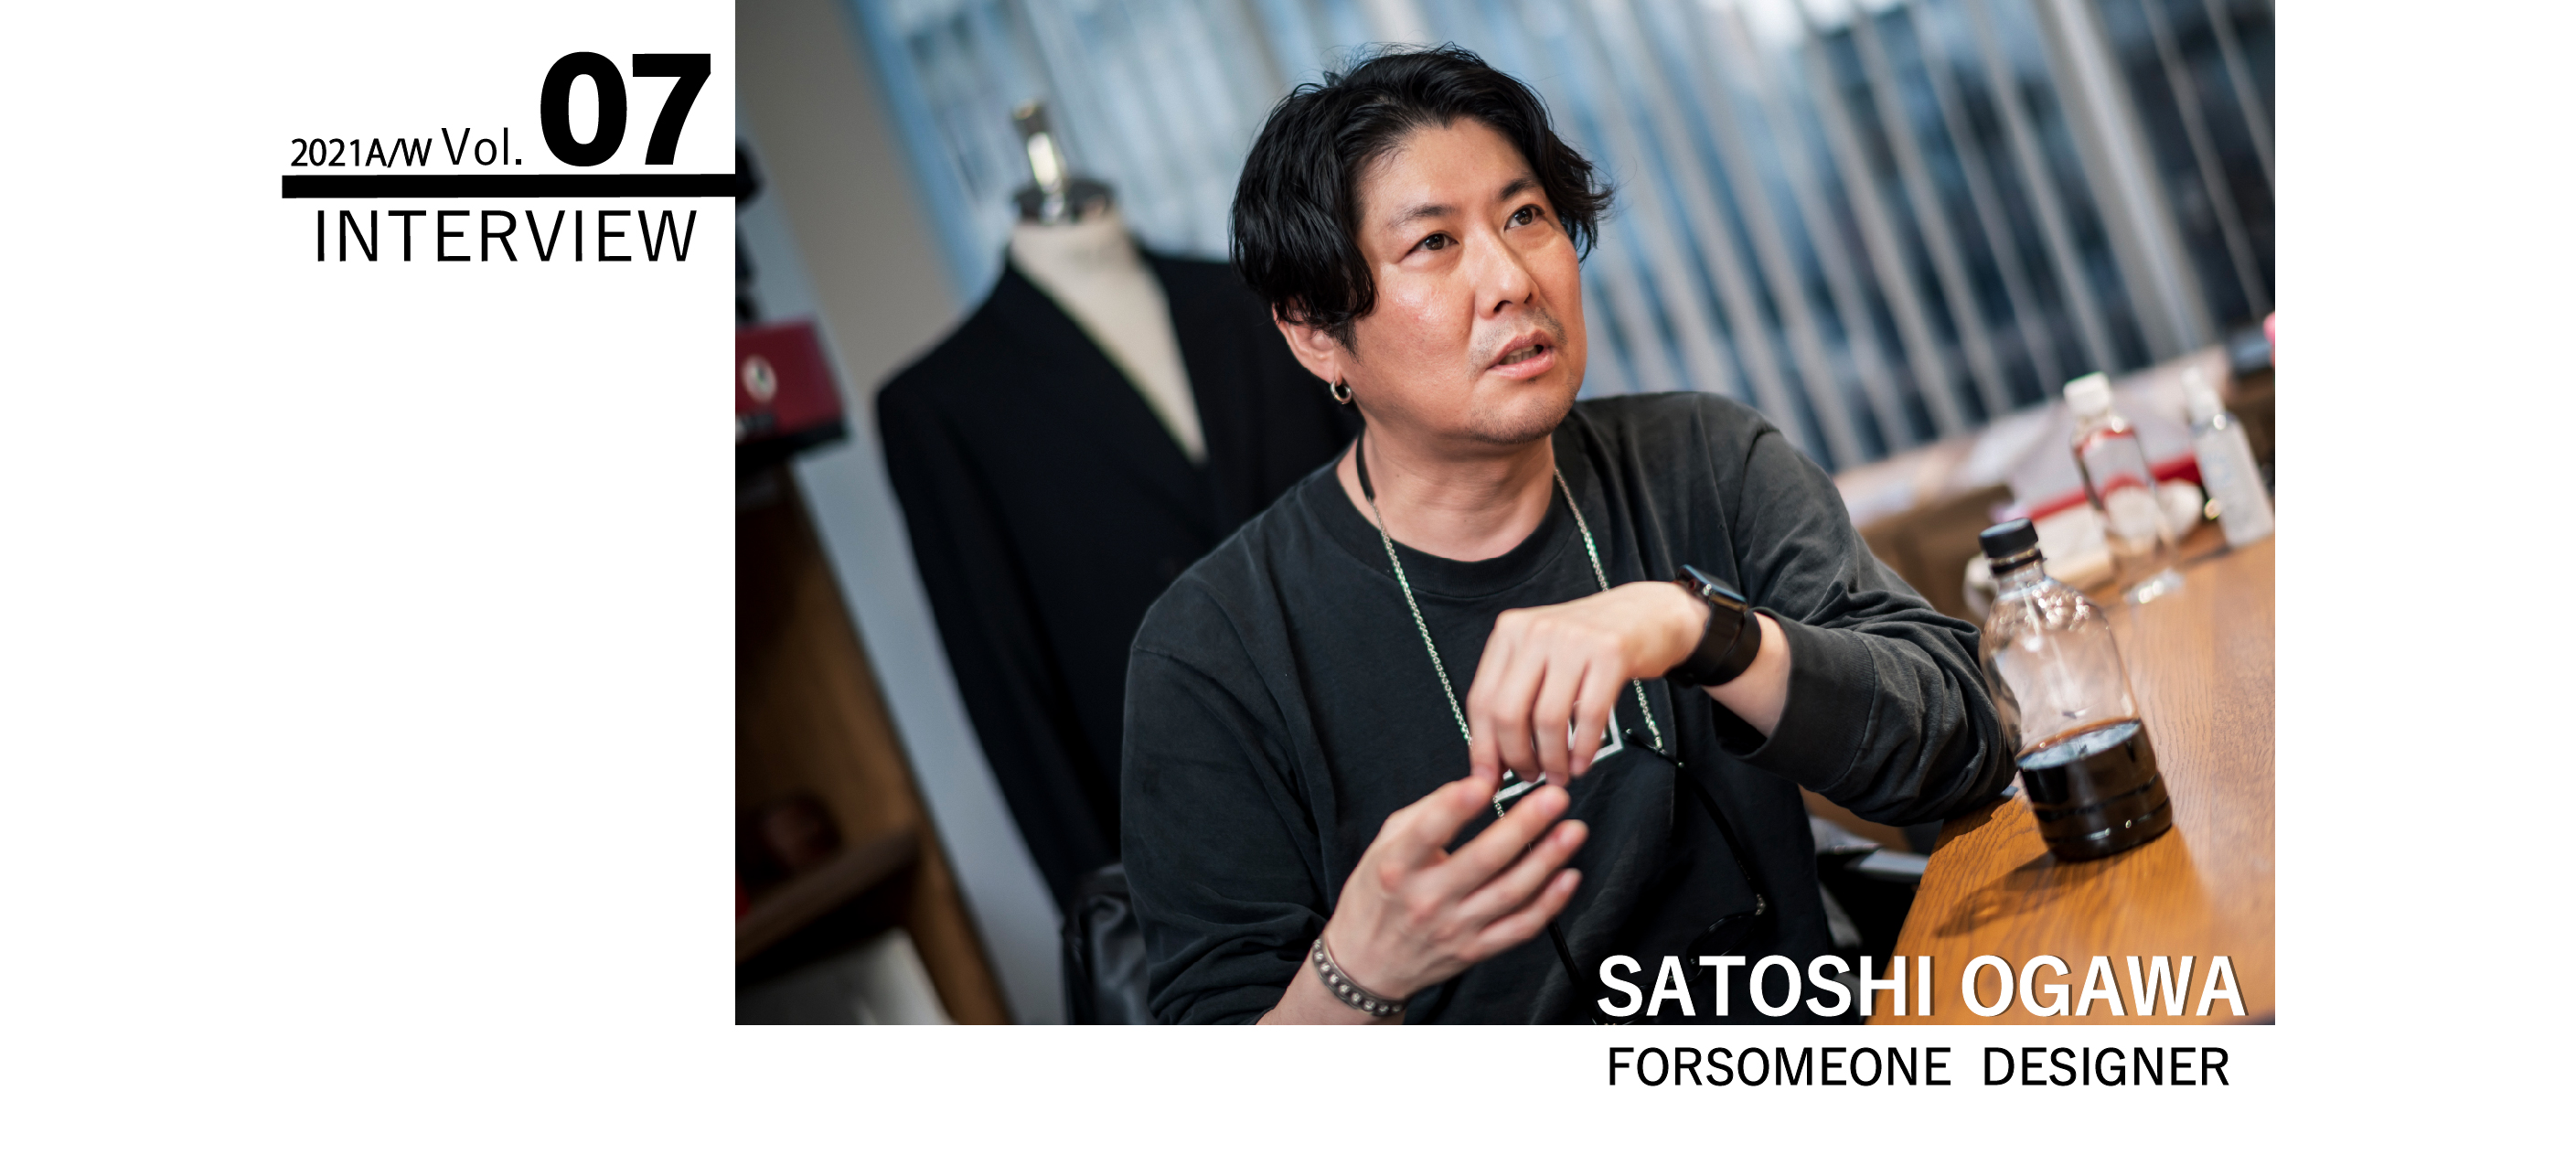 小川 哲史 Satoshi Ogawa